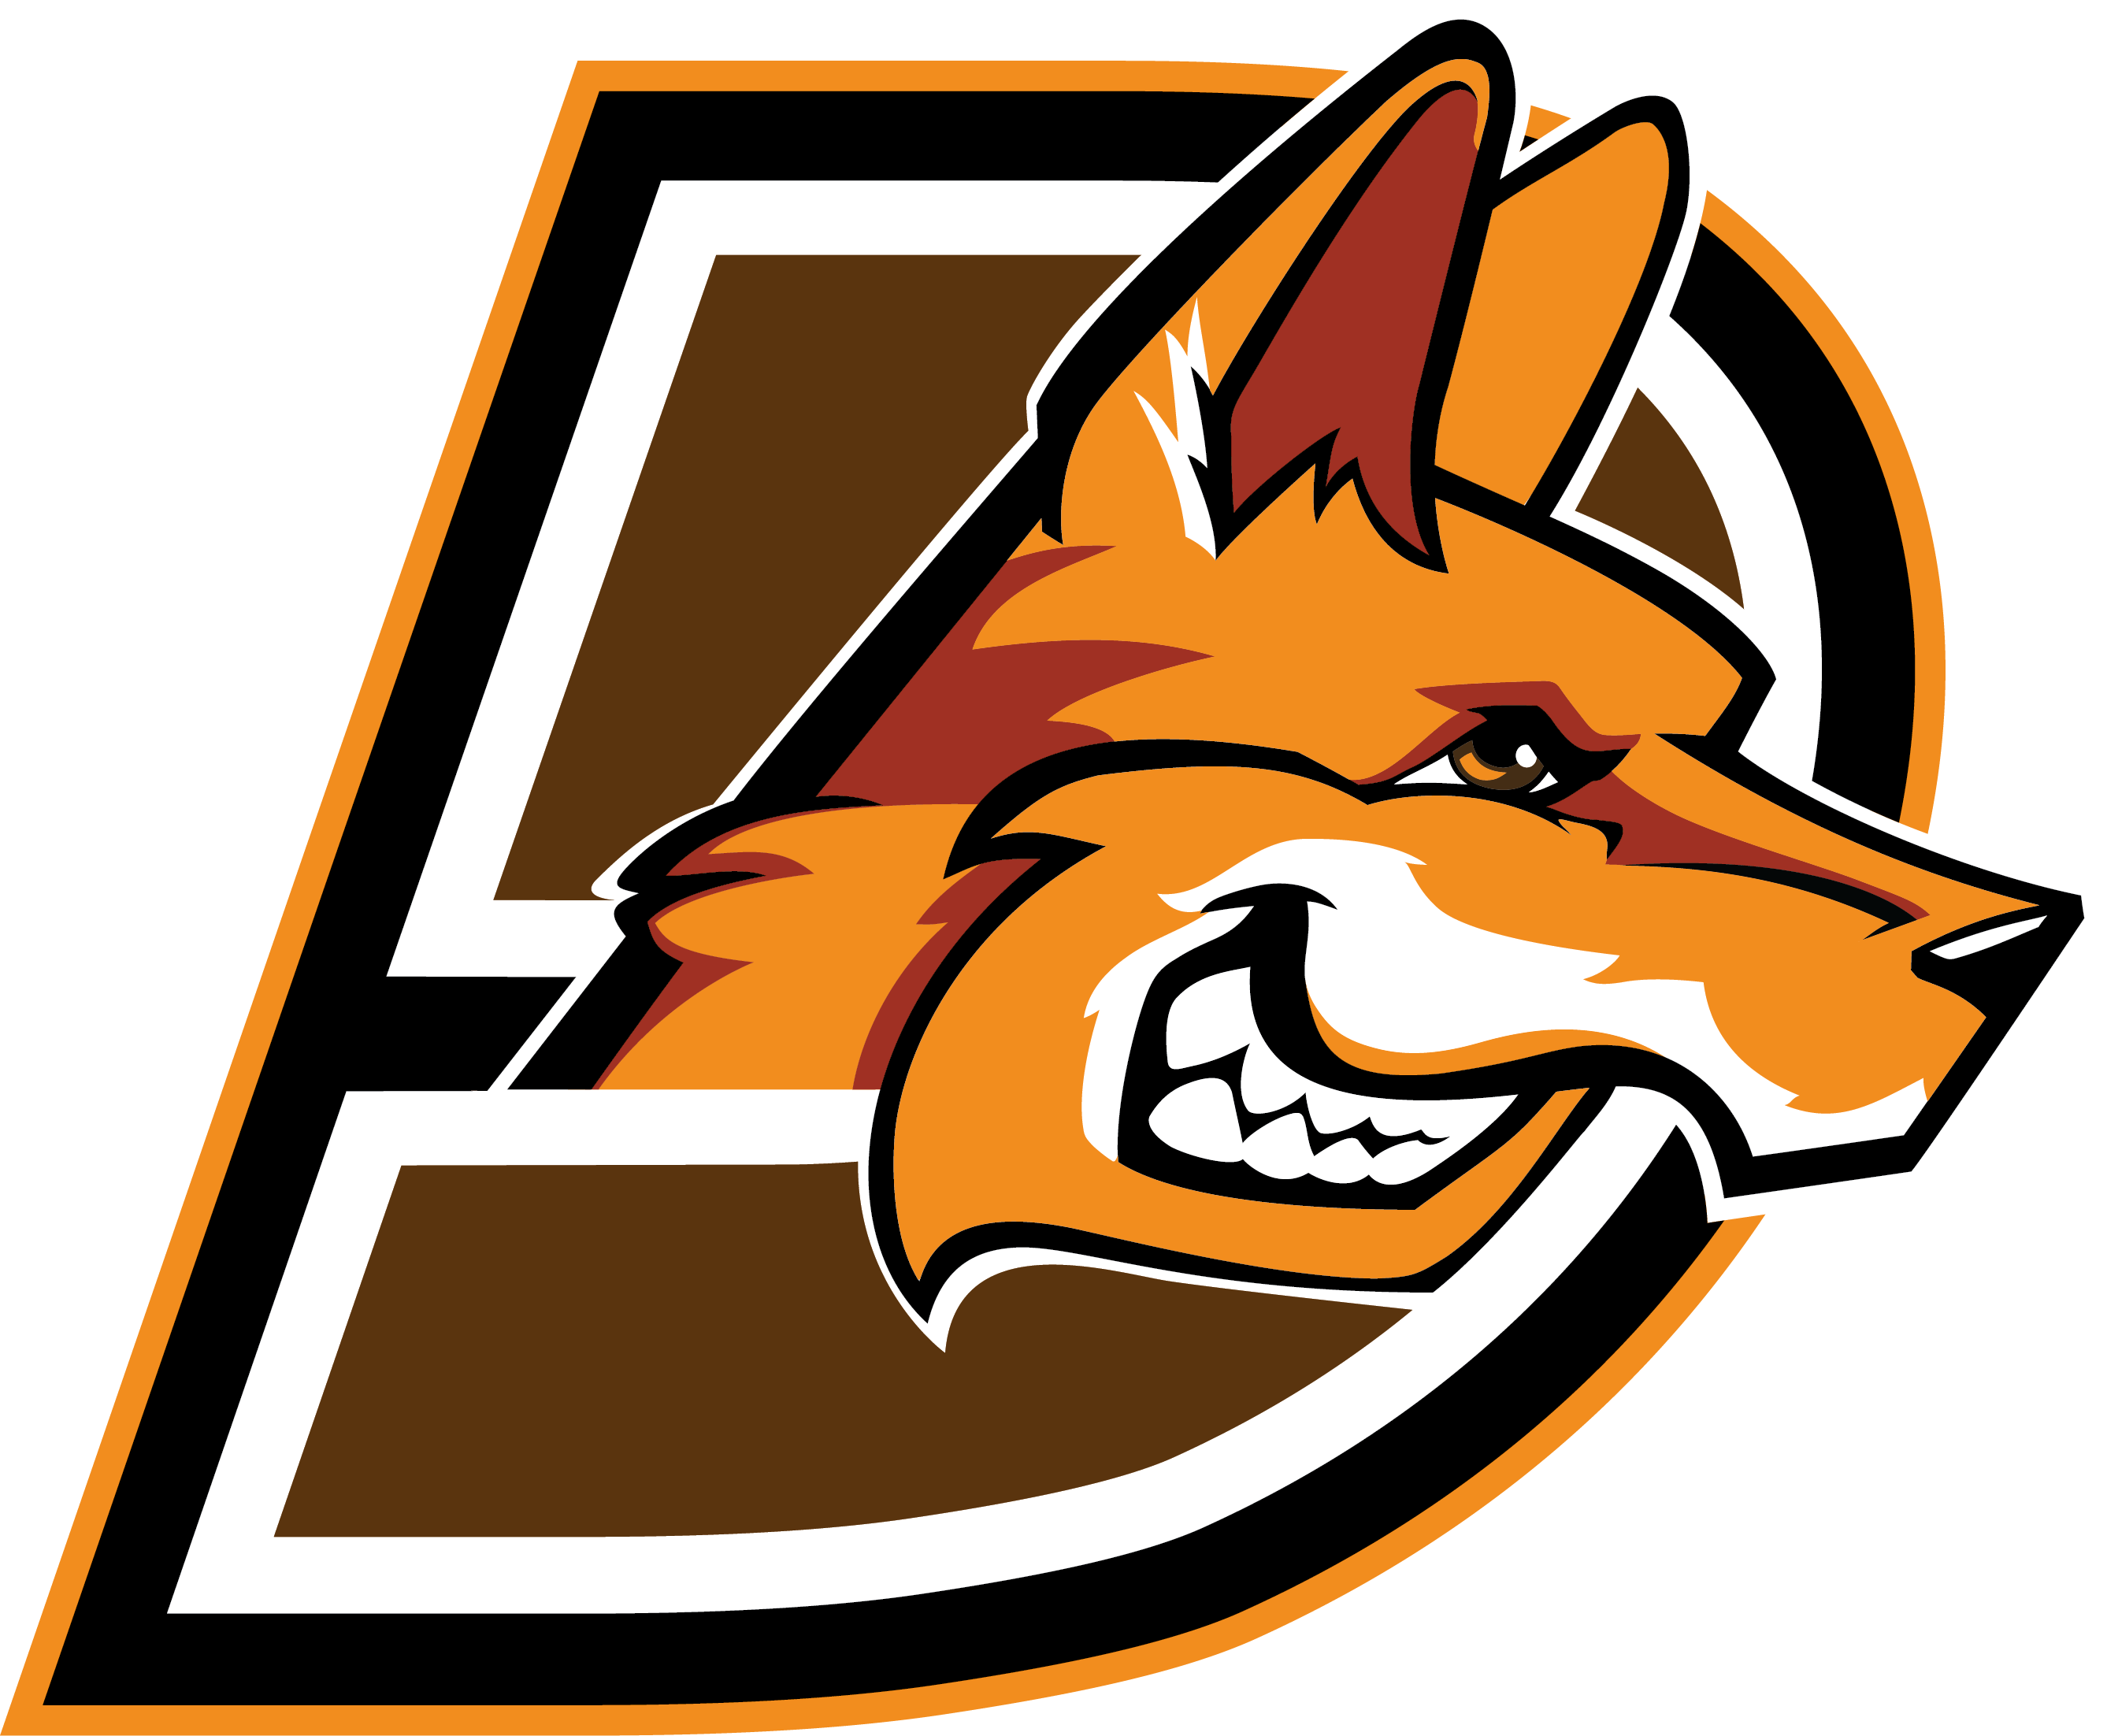 Clipart grizzlies baseball logo graphic library download Dingoes Baseball 9U graphic library download